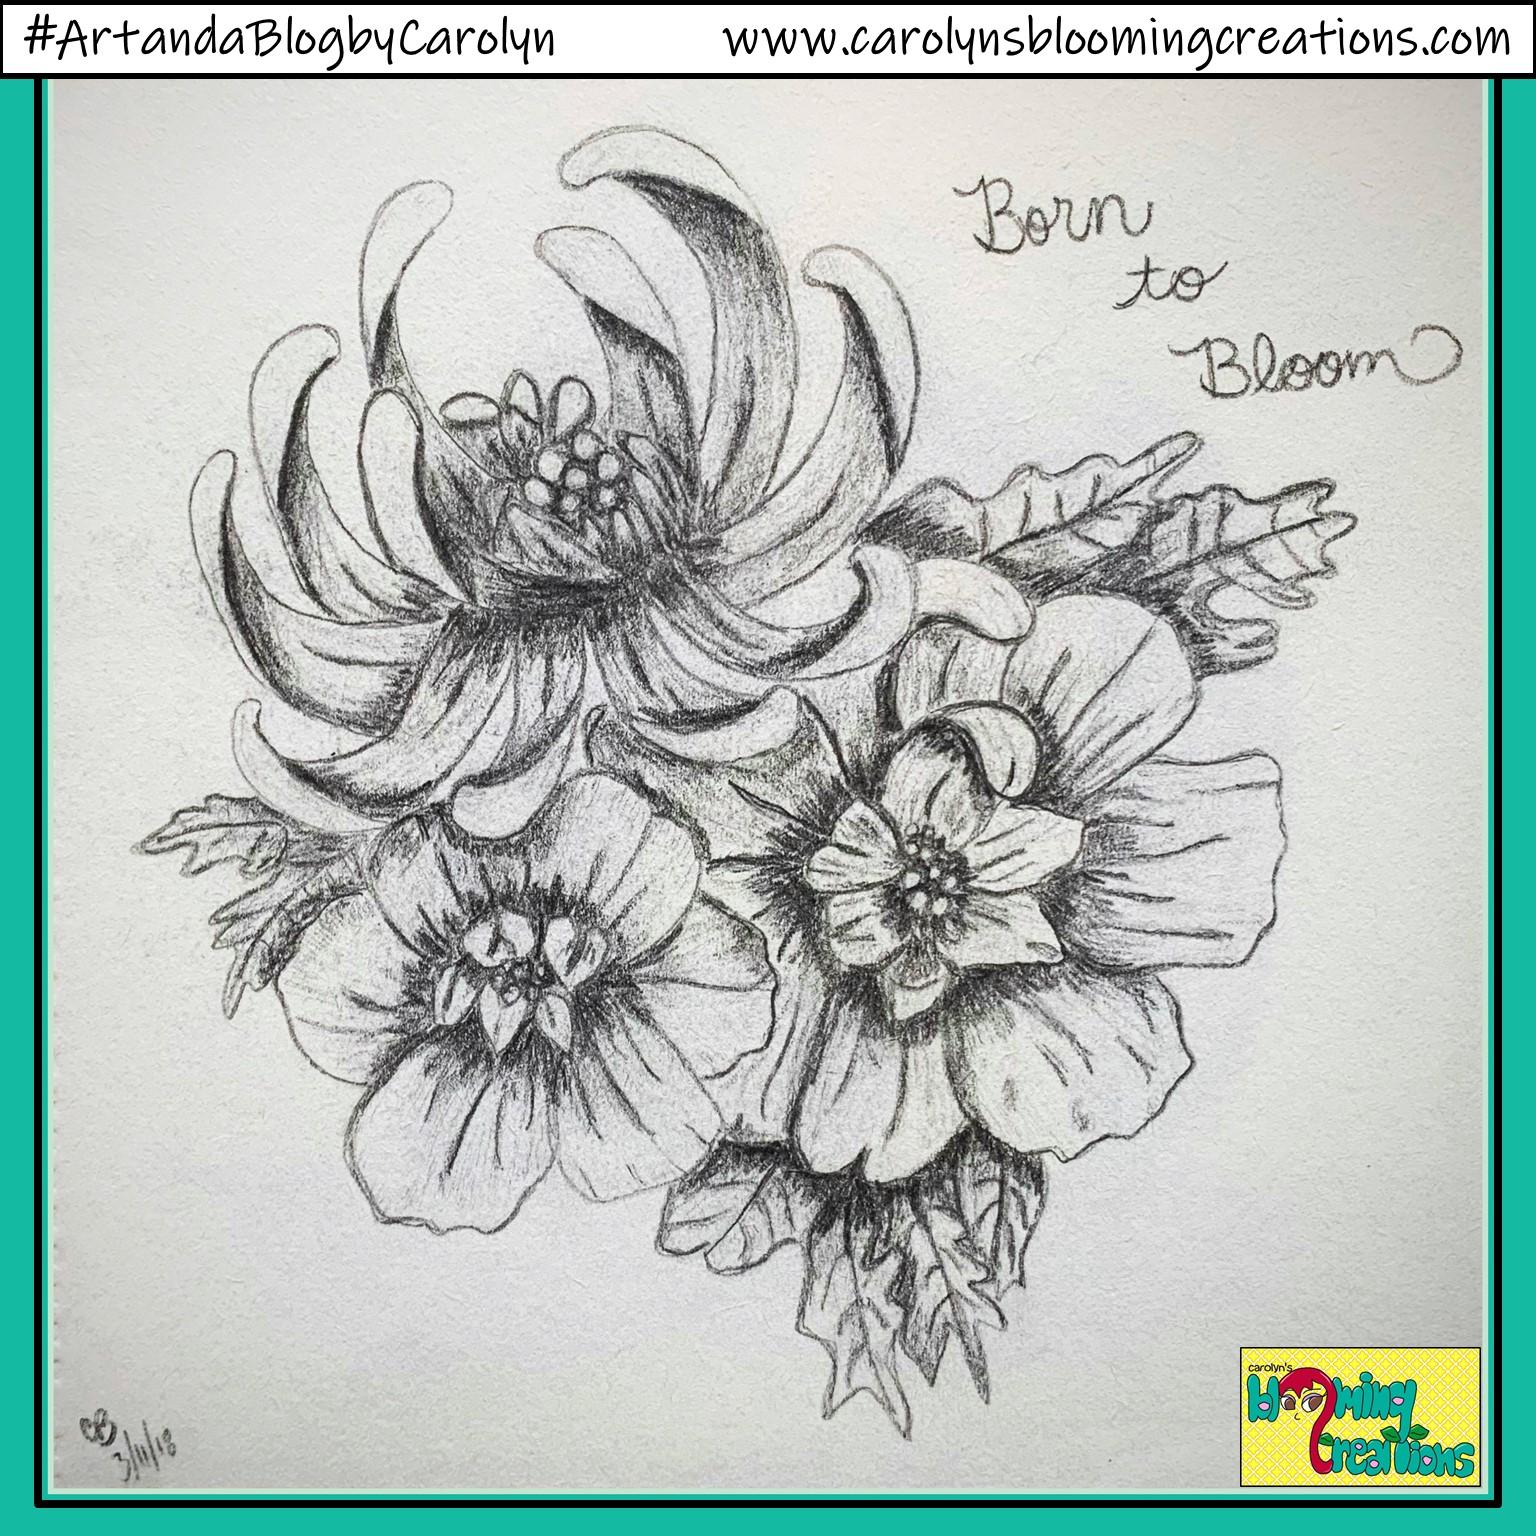 Art by Carolyn J. Braden, Media: BIC pencil on paper